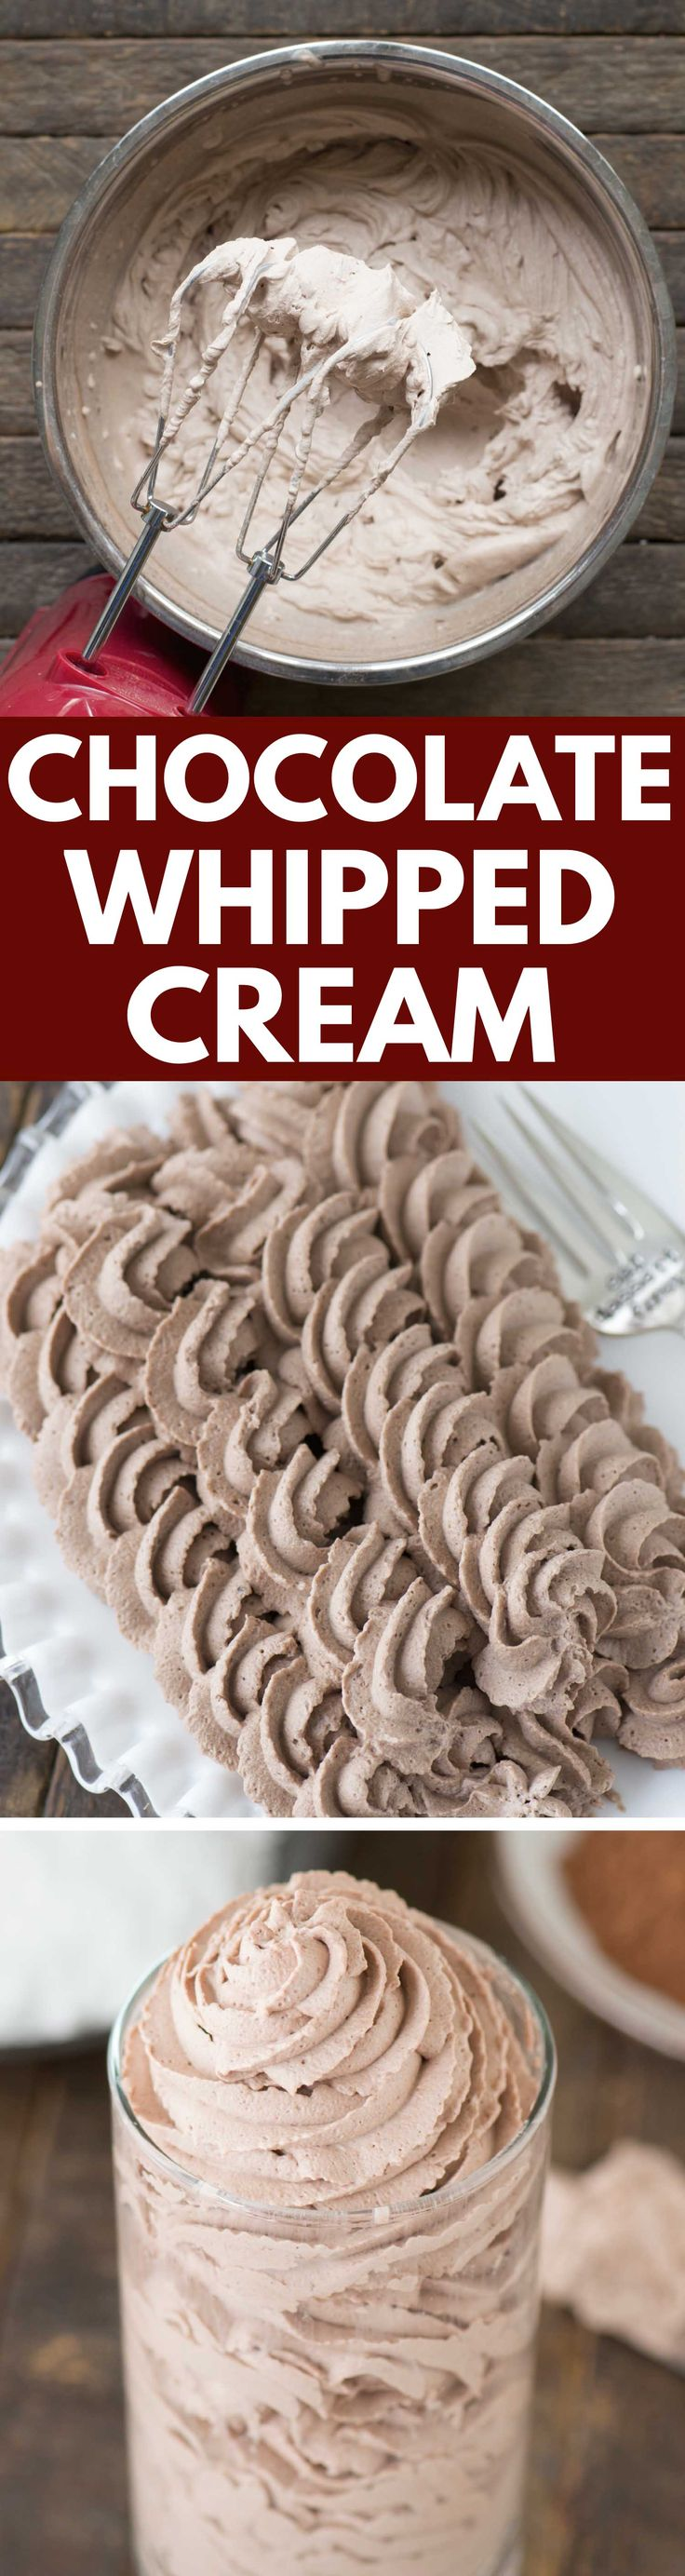 Best 25+ Whipped cream ideas on Pinterest | Whipped cream frosting ...